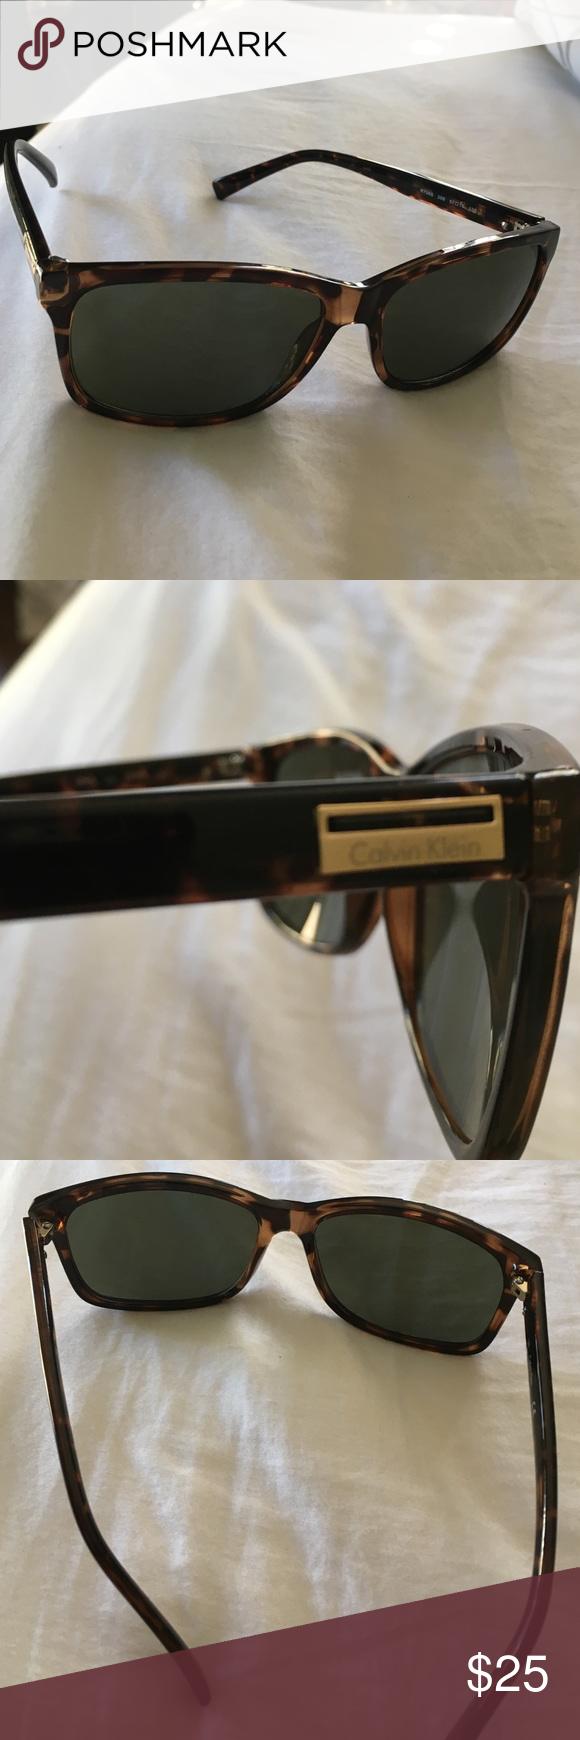 Calvin Klein sunglasses Tortoise shell Calvin Klein sunglasses. Never worn. Like new! Calvin Klein Accessories Sunglasses